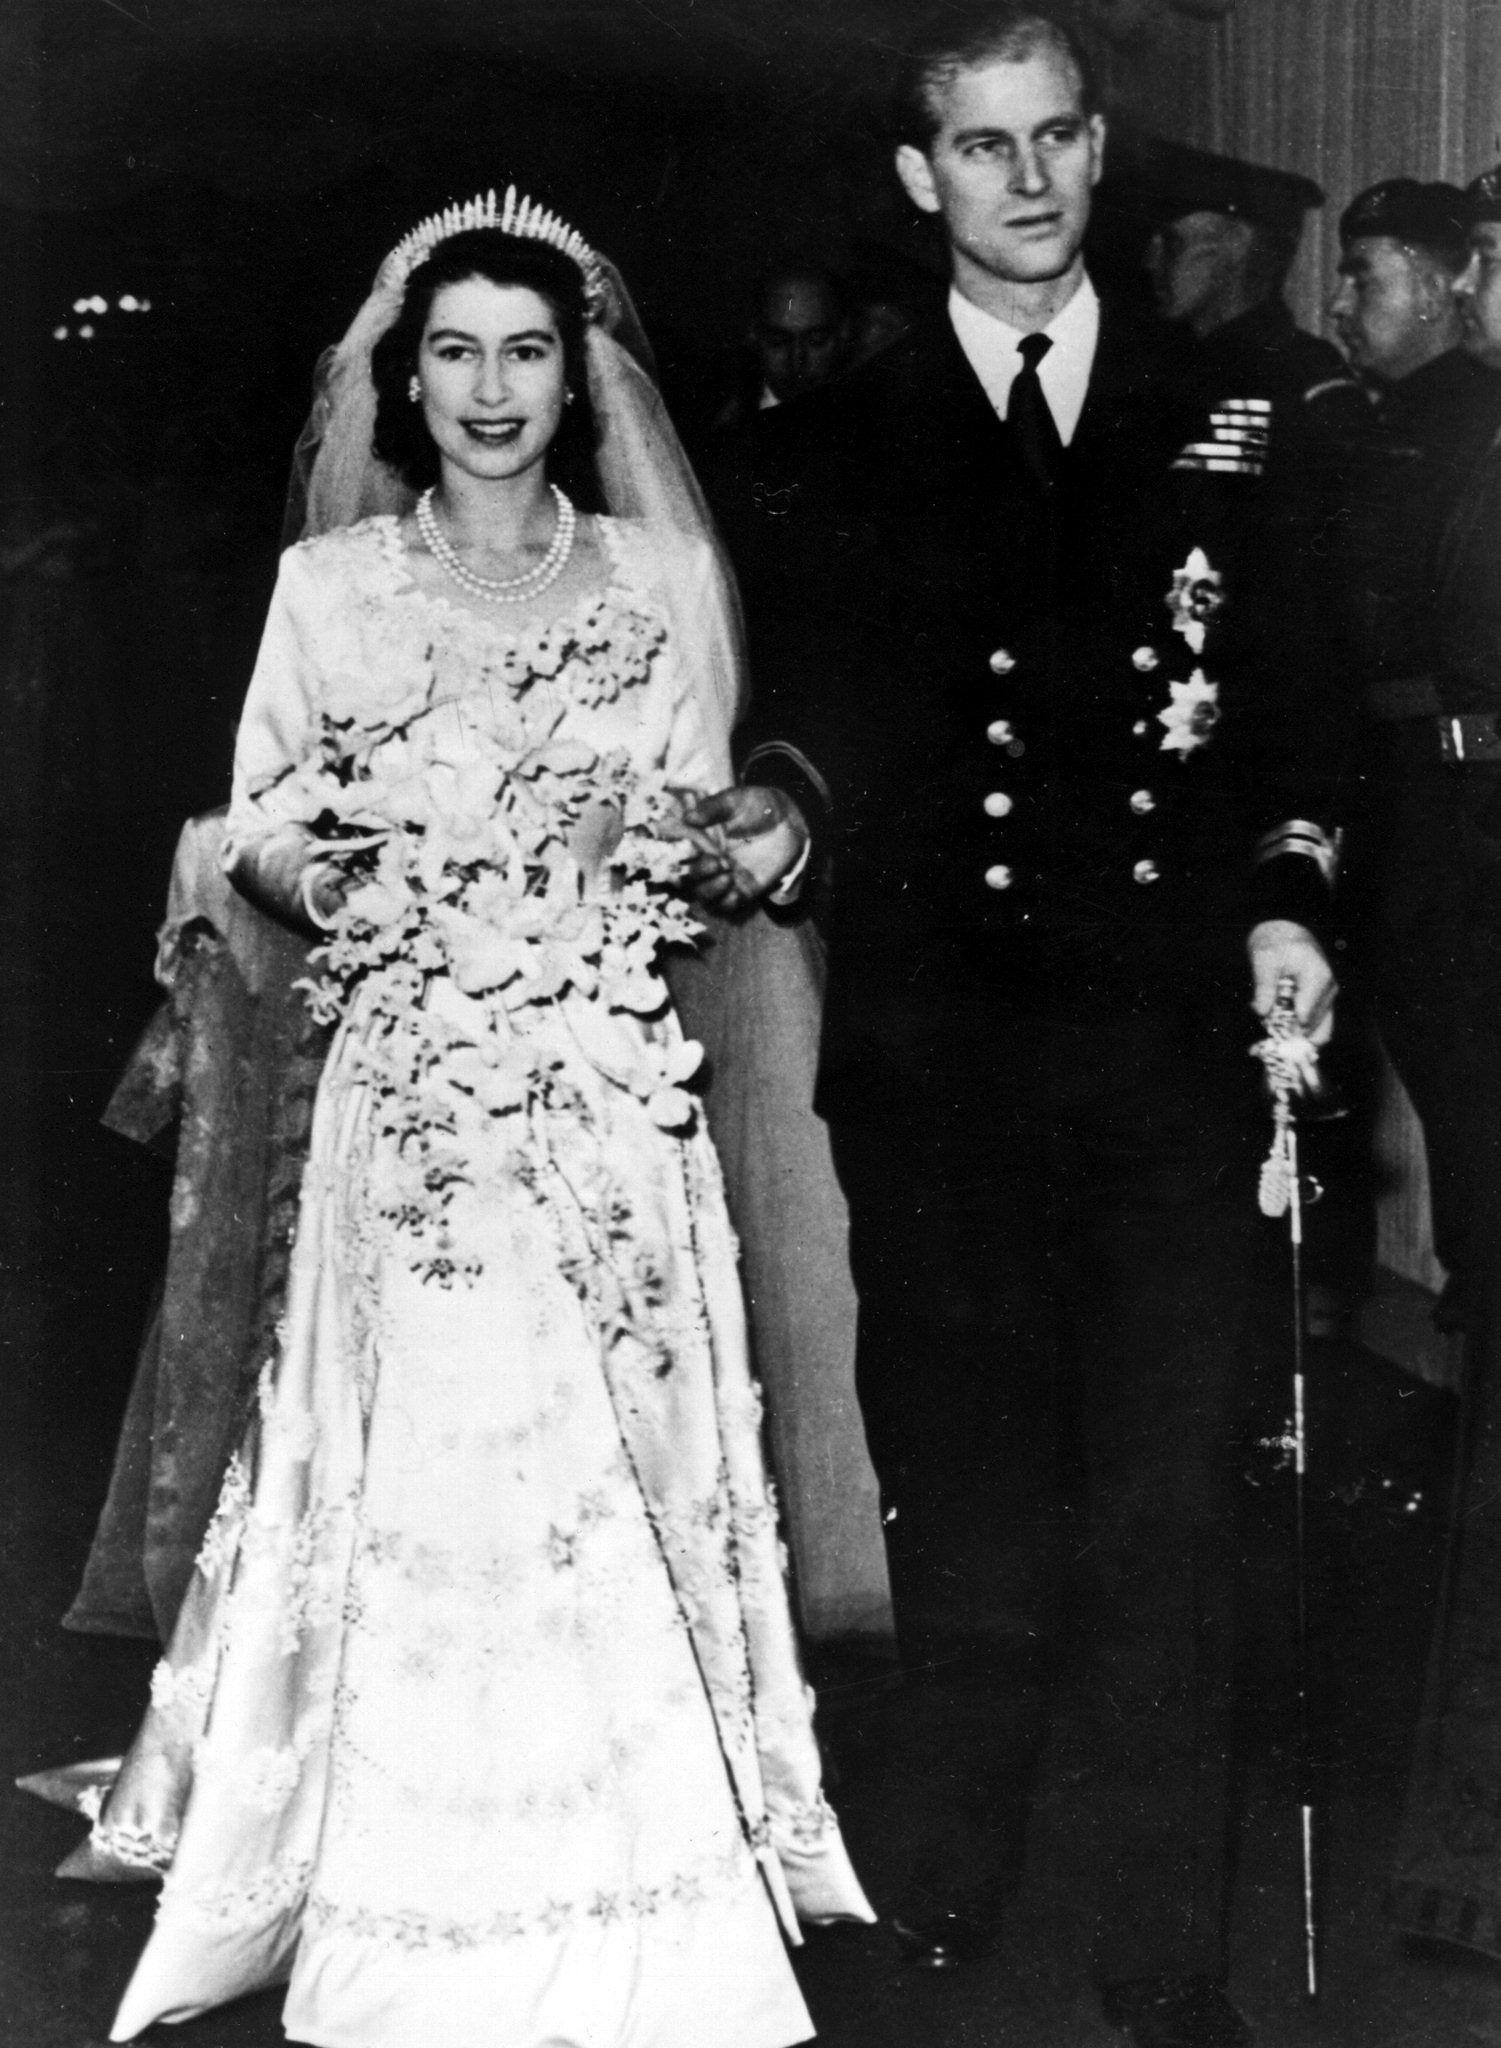 ORIGINALEN: Daværende prinsesse Elizabeth og ektemannen prins Philip 20. november 1947.